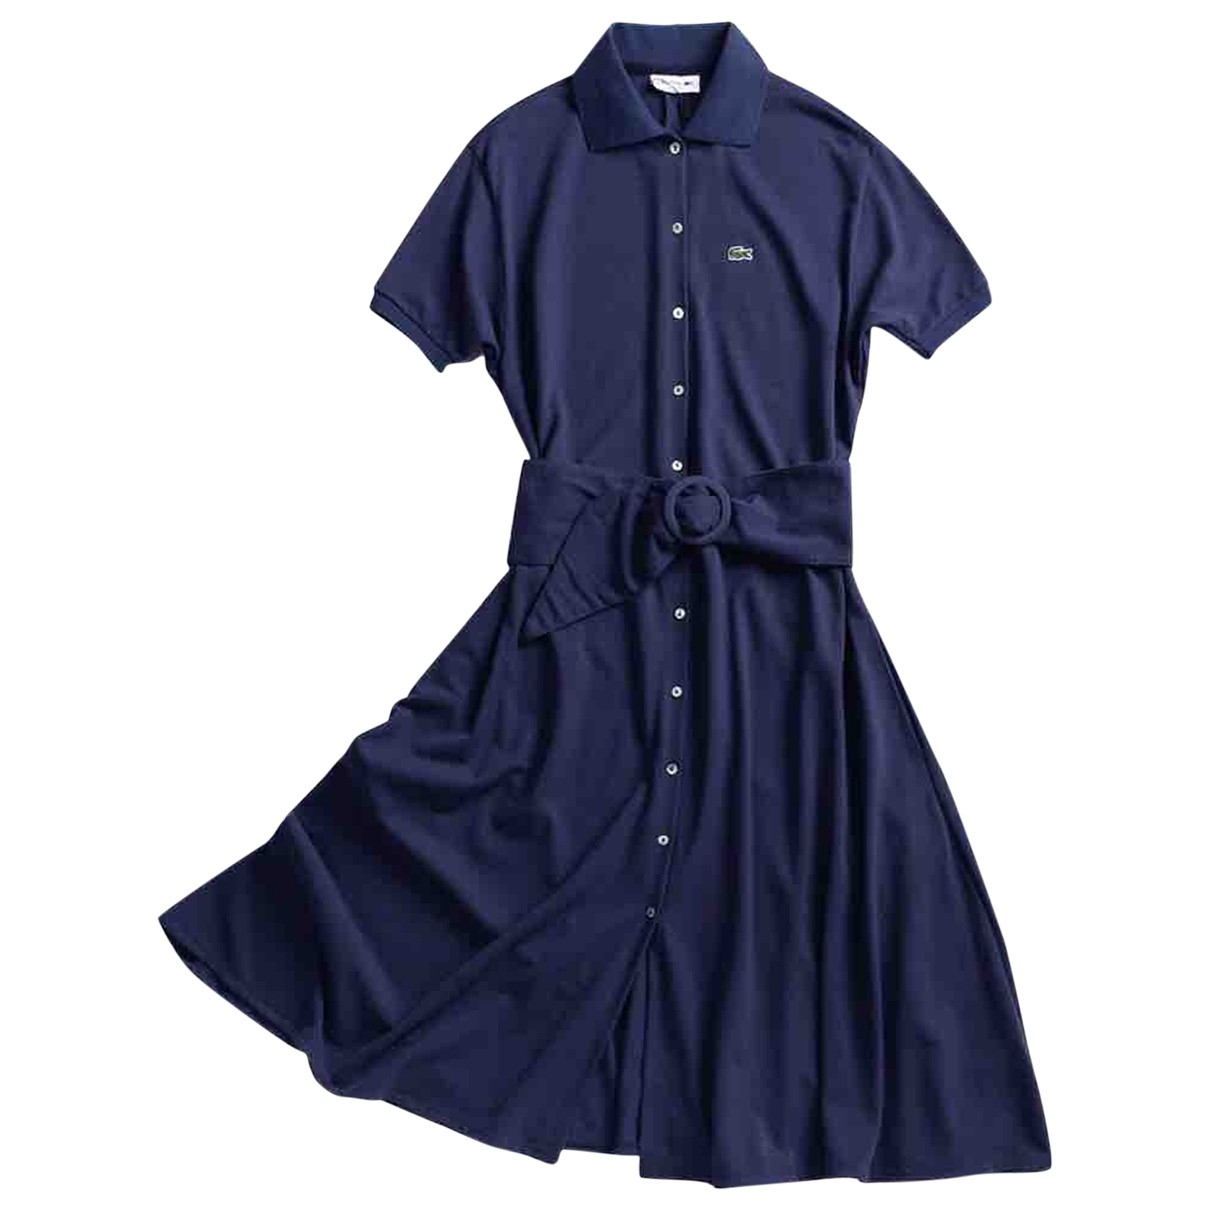 Lacoste \N Blue Cotton dress for Women 36 FR